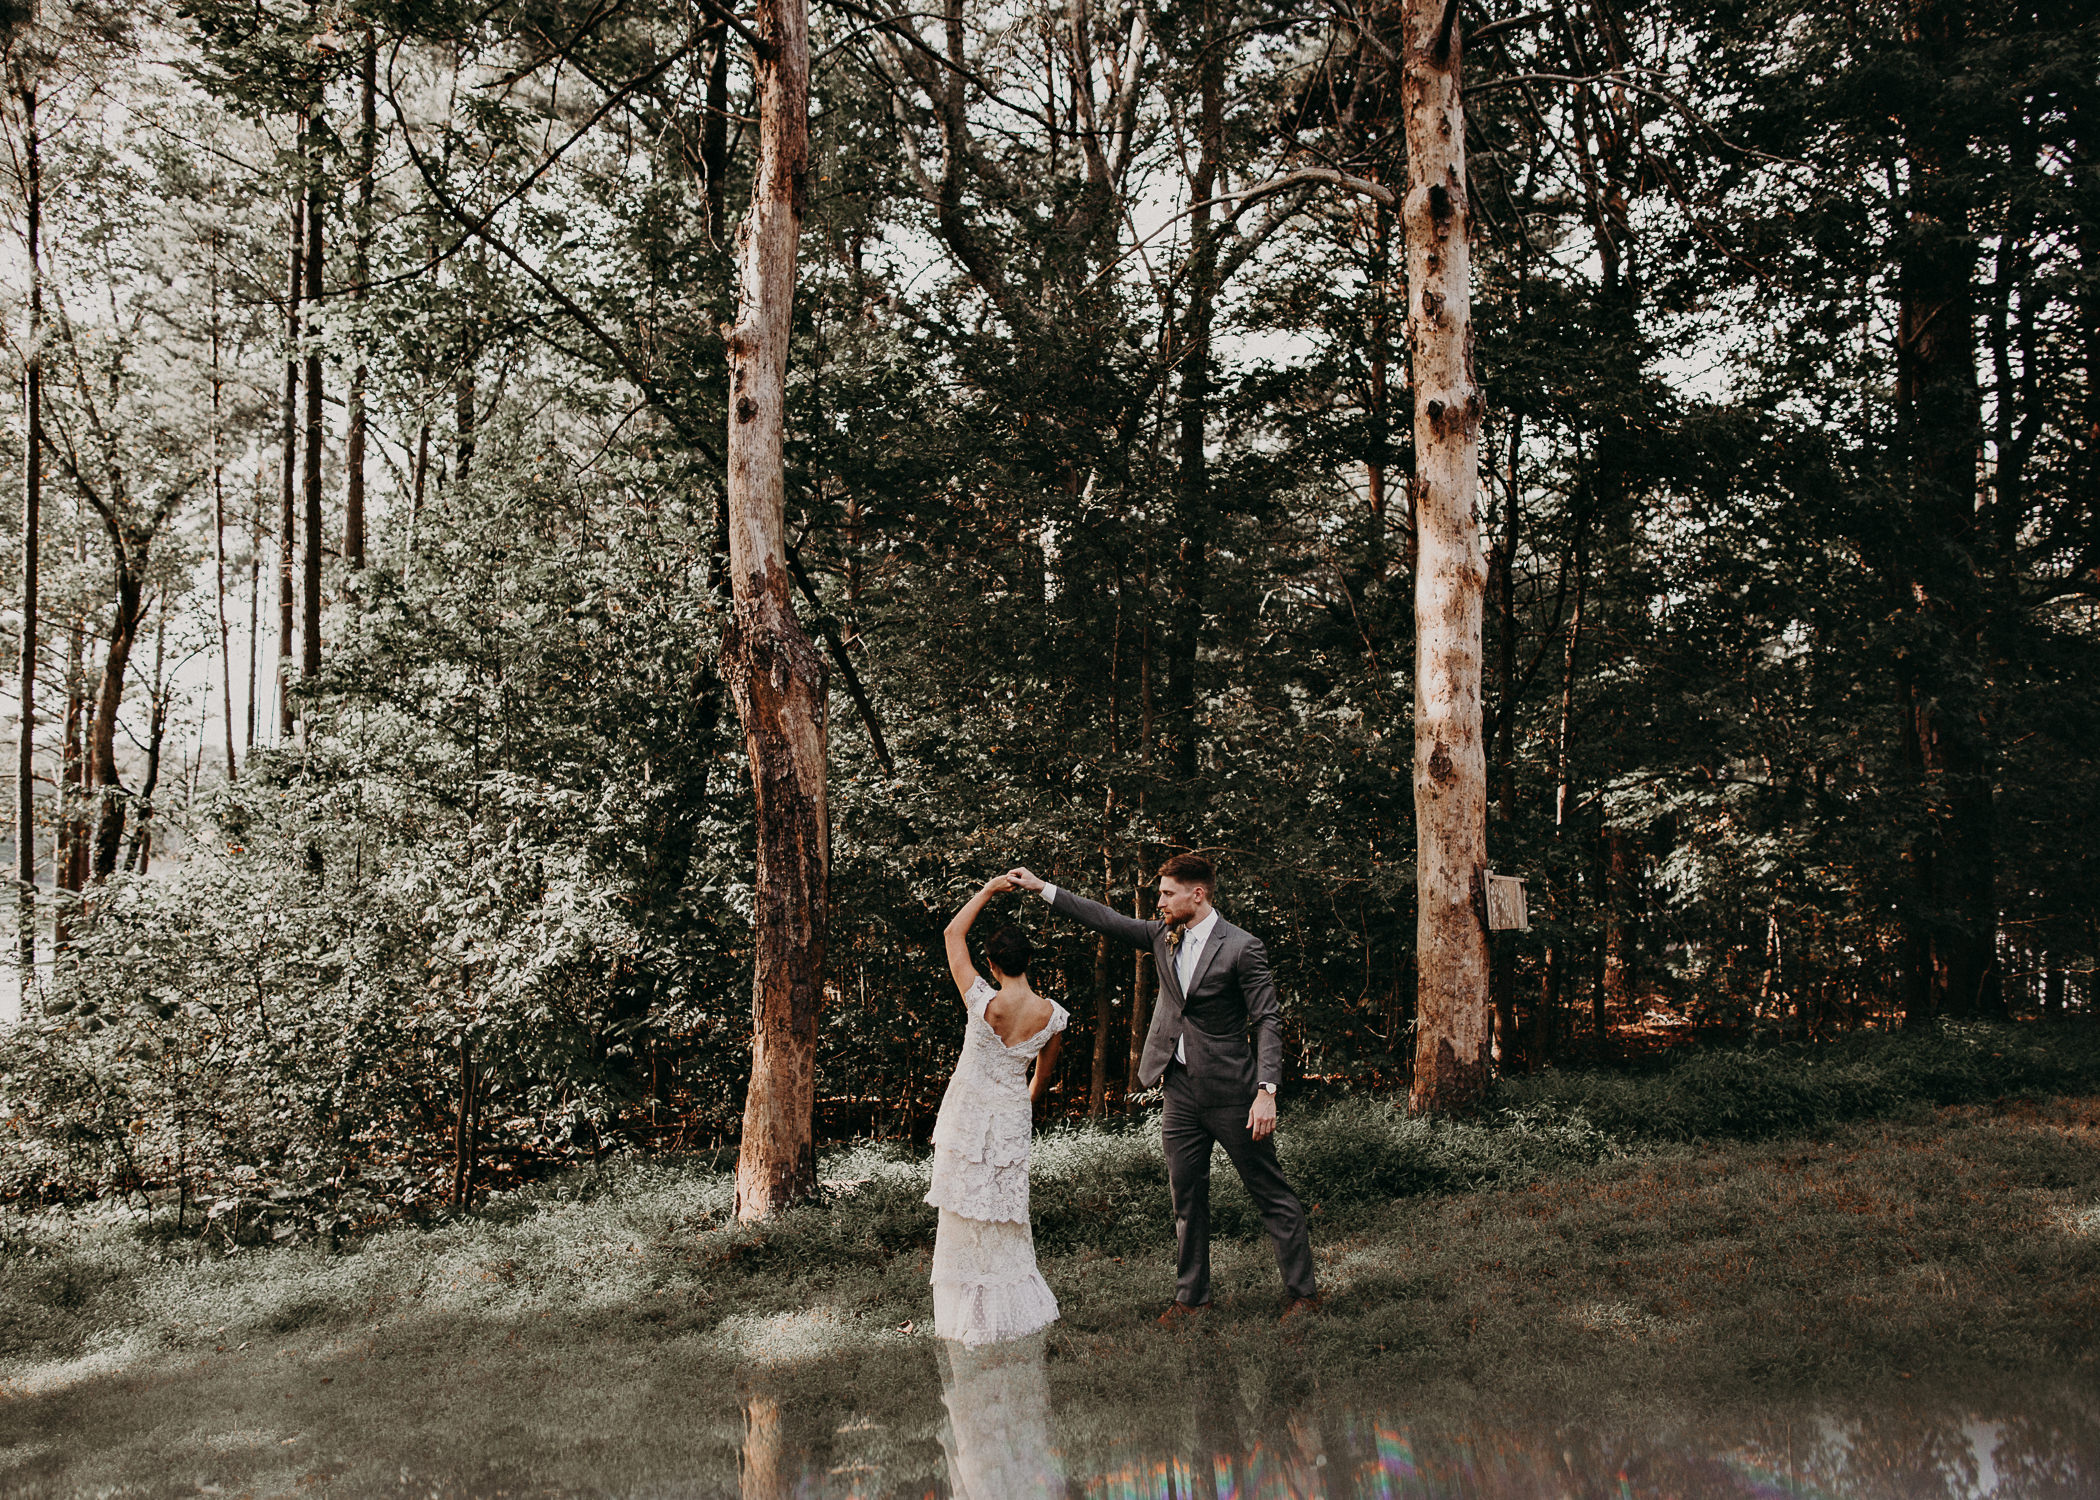 41 Bride & Groom first look before the ceremony on wedding day - Atlanta Wedding Photographer .jpg